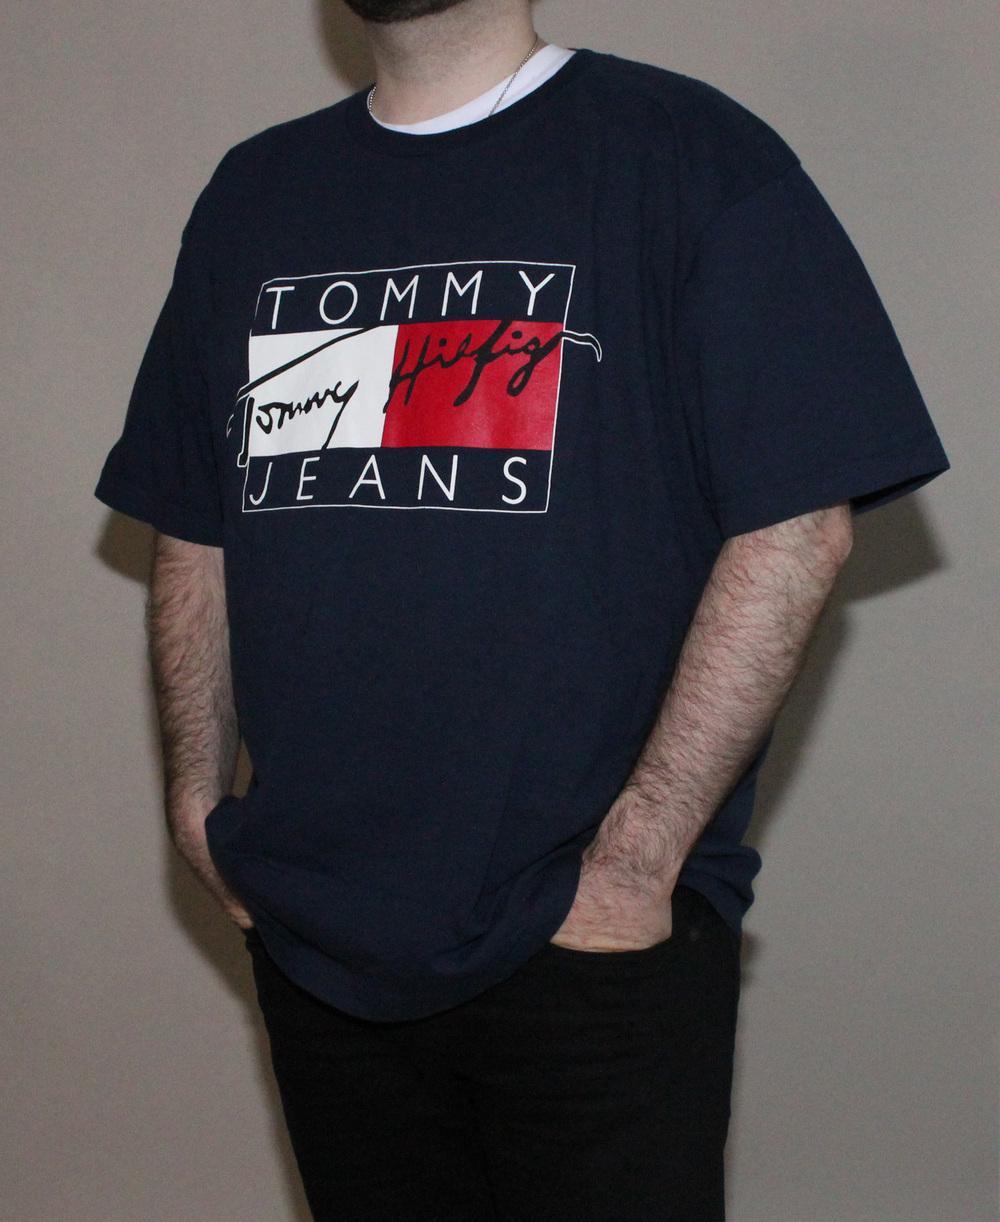 70e3fb8e5 Vintage Tommy Hilfiger Tommy Jeans navy Signature logo t shirt